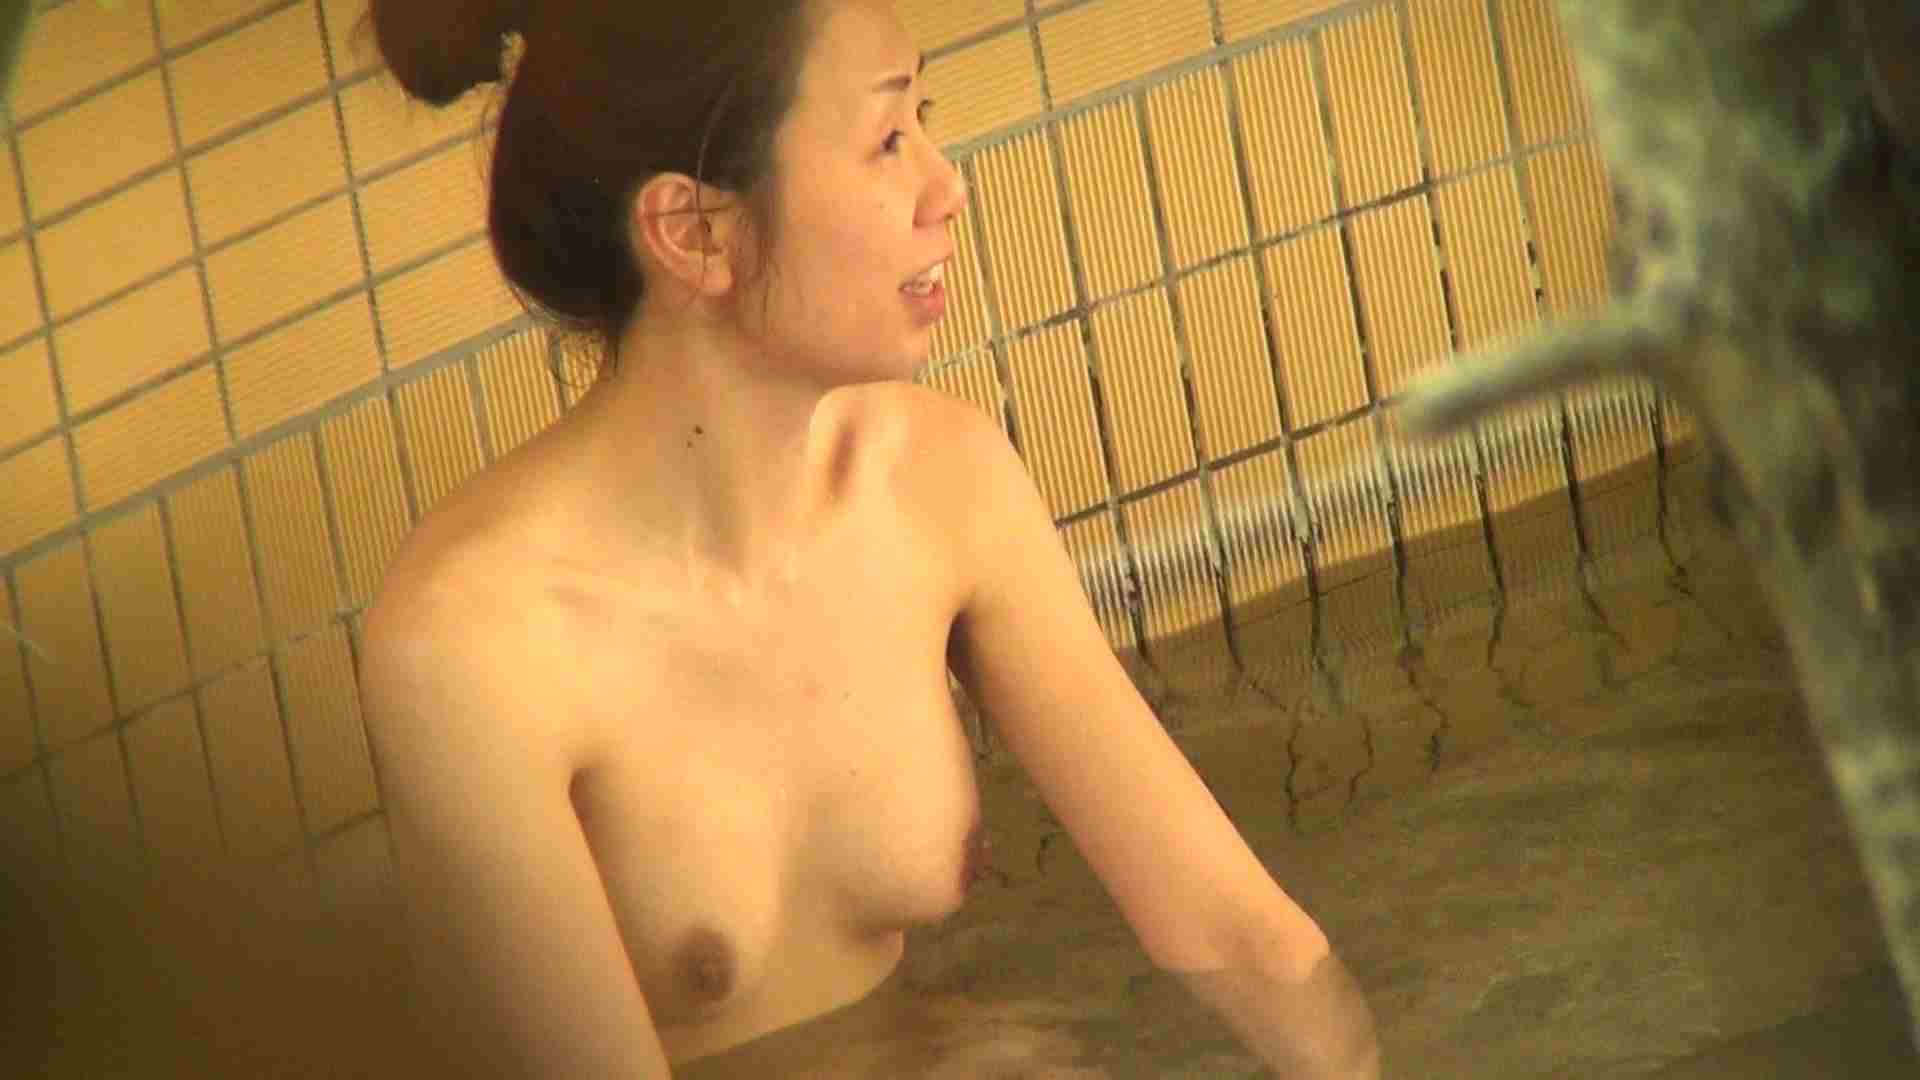 Aquaな露天風呂Vol.312 露天 おまんこ無修正動画無料 71連発 14